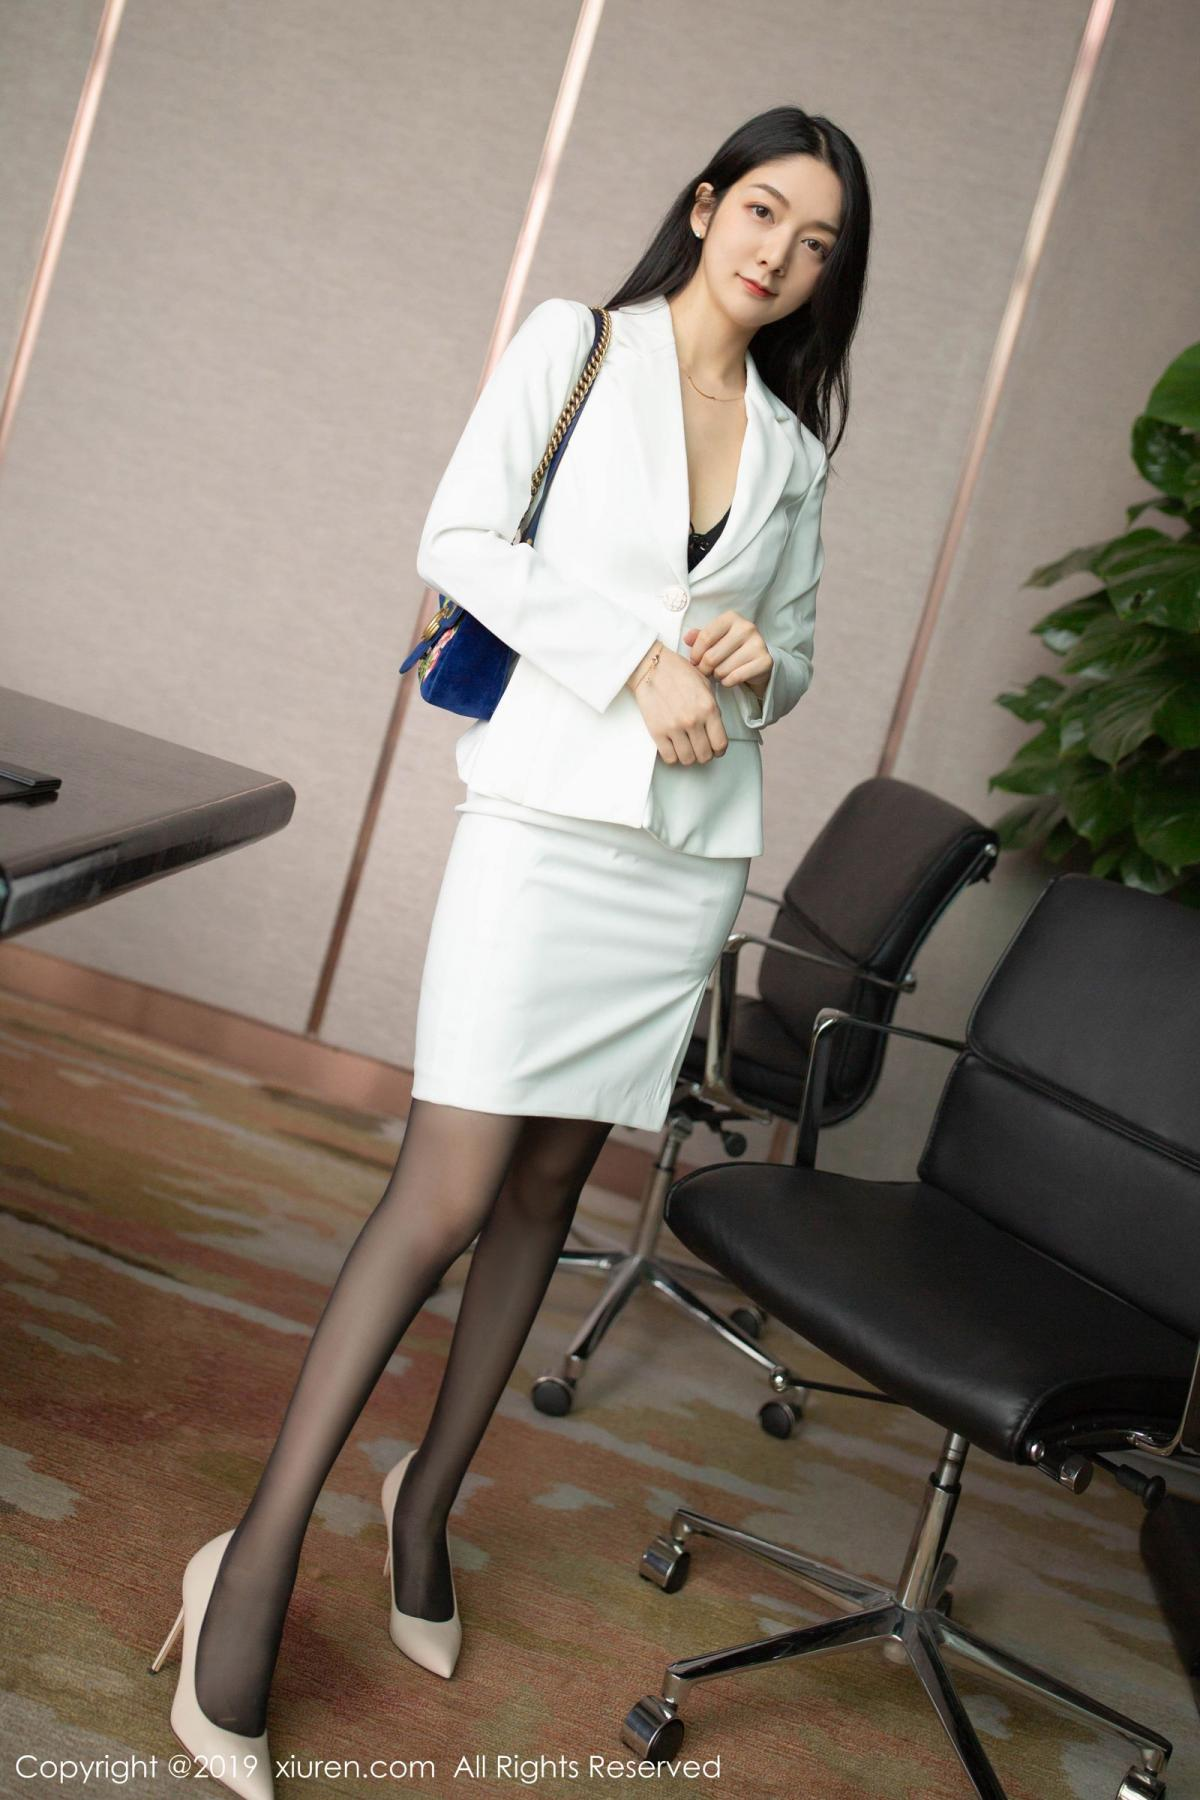 [XiuRen] Vol.1821 Come to my room and sit after you get off work 7P, Black Silk, Di Yi, Xiuren